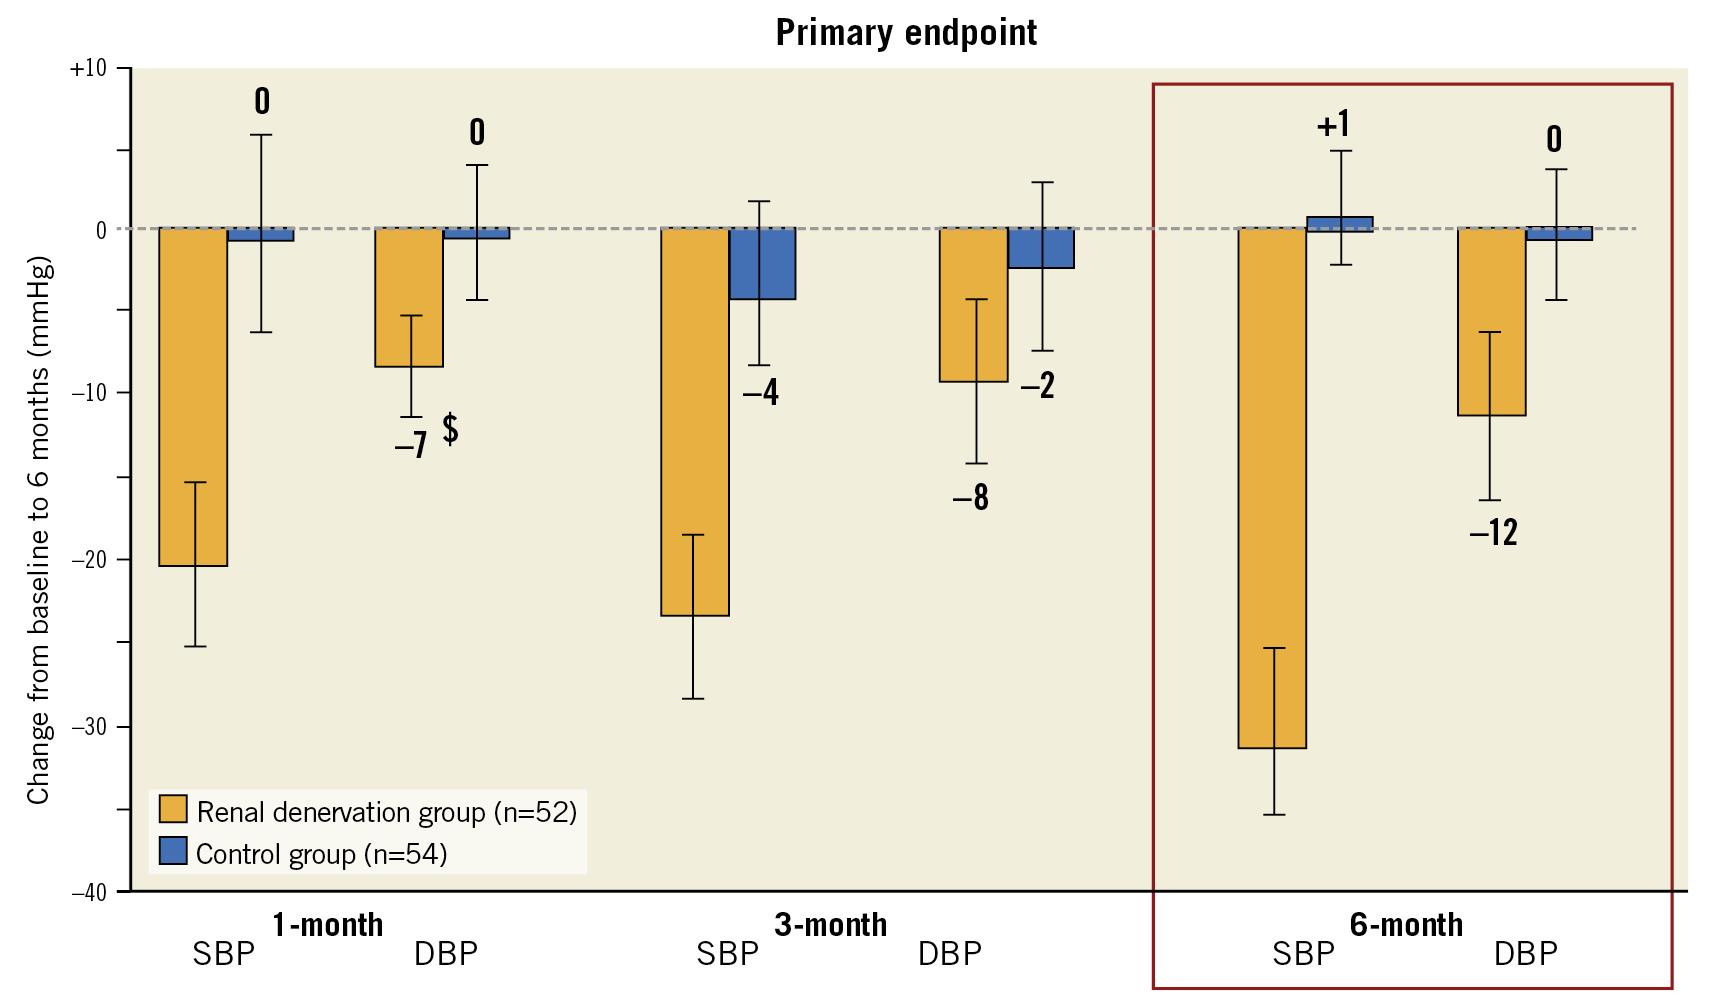 Figure 2. Symplicity HTN-2: uncontrolled study.